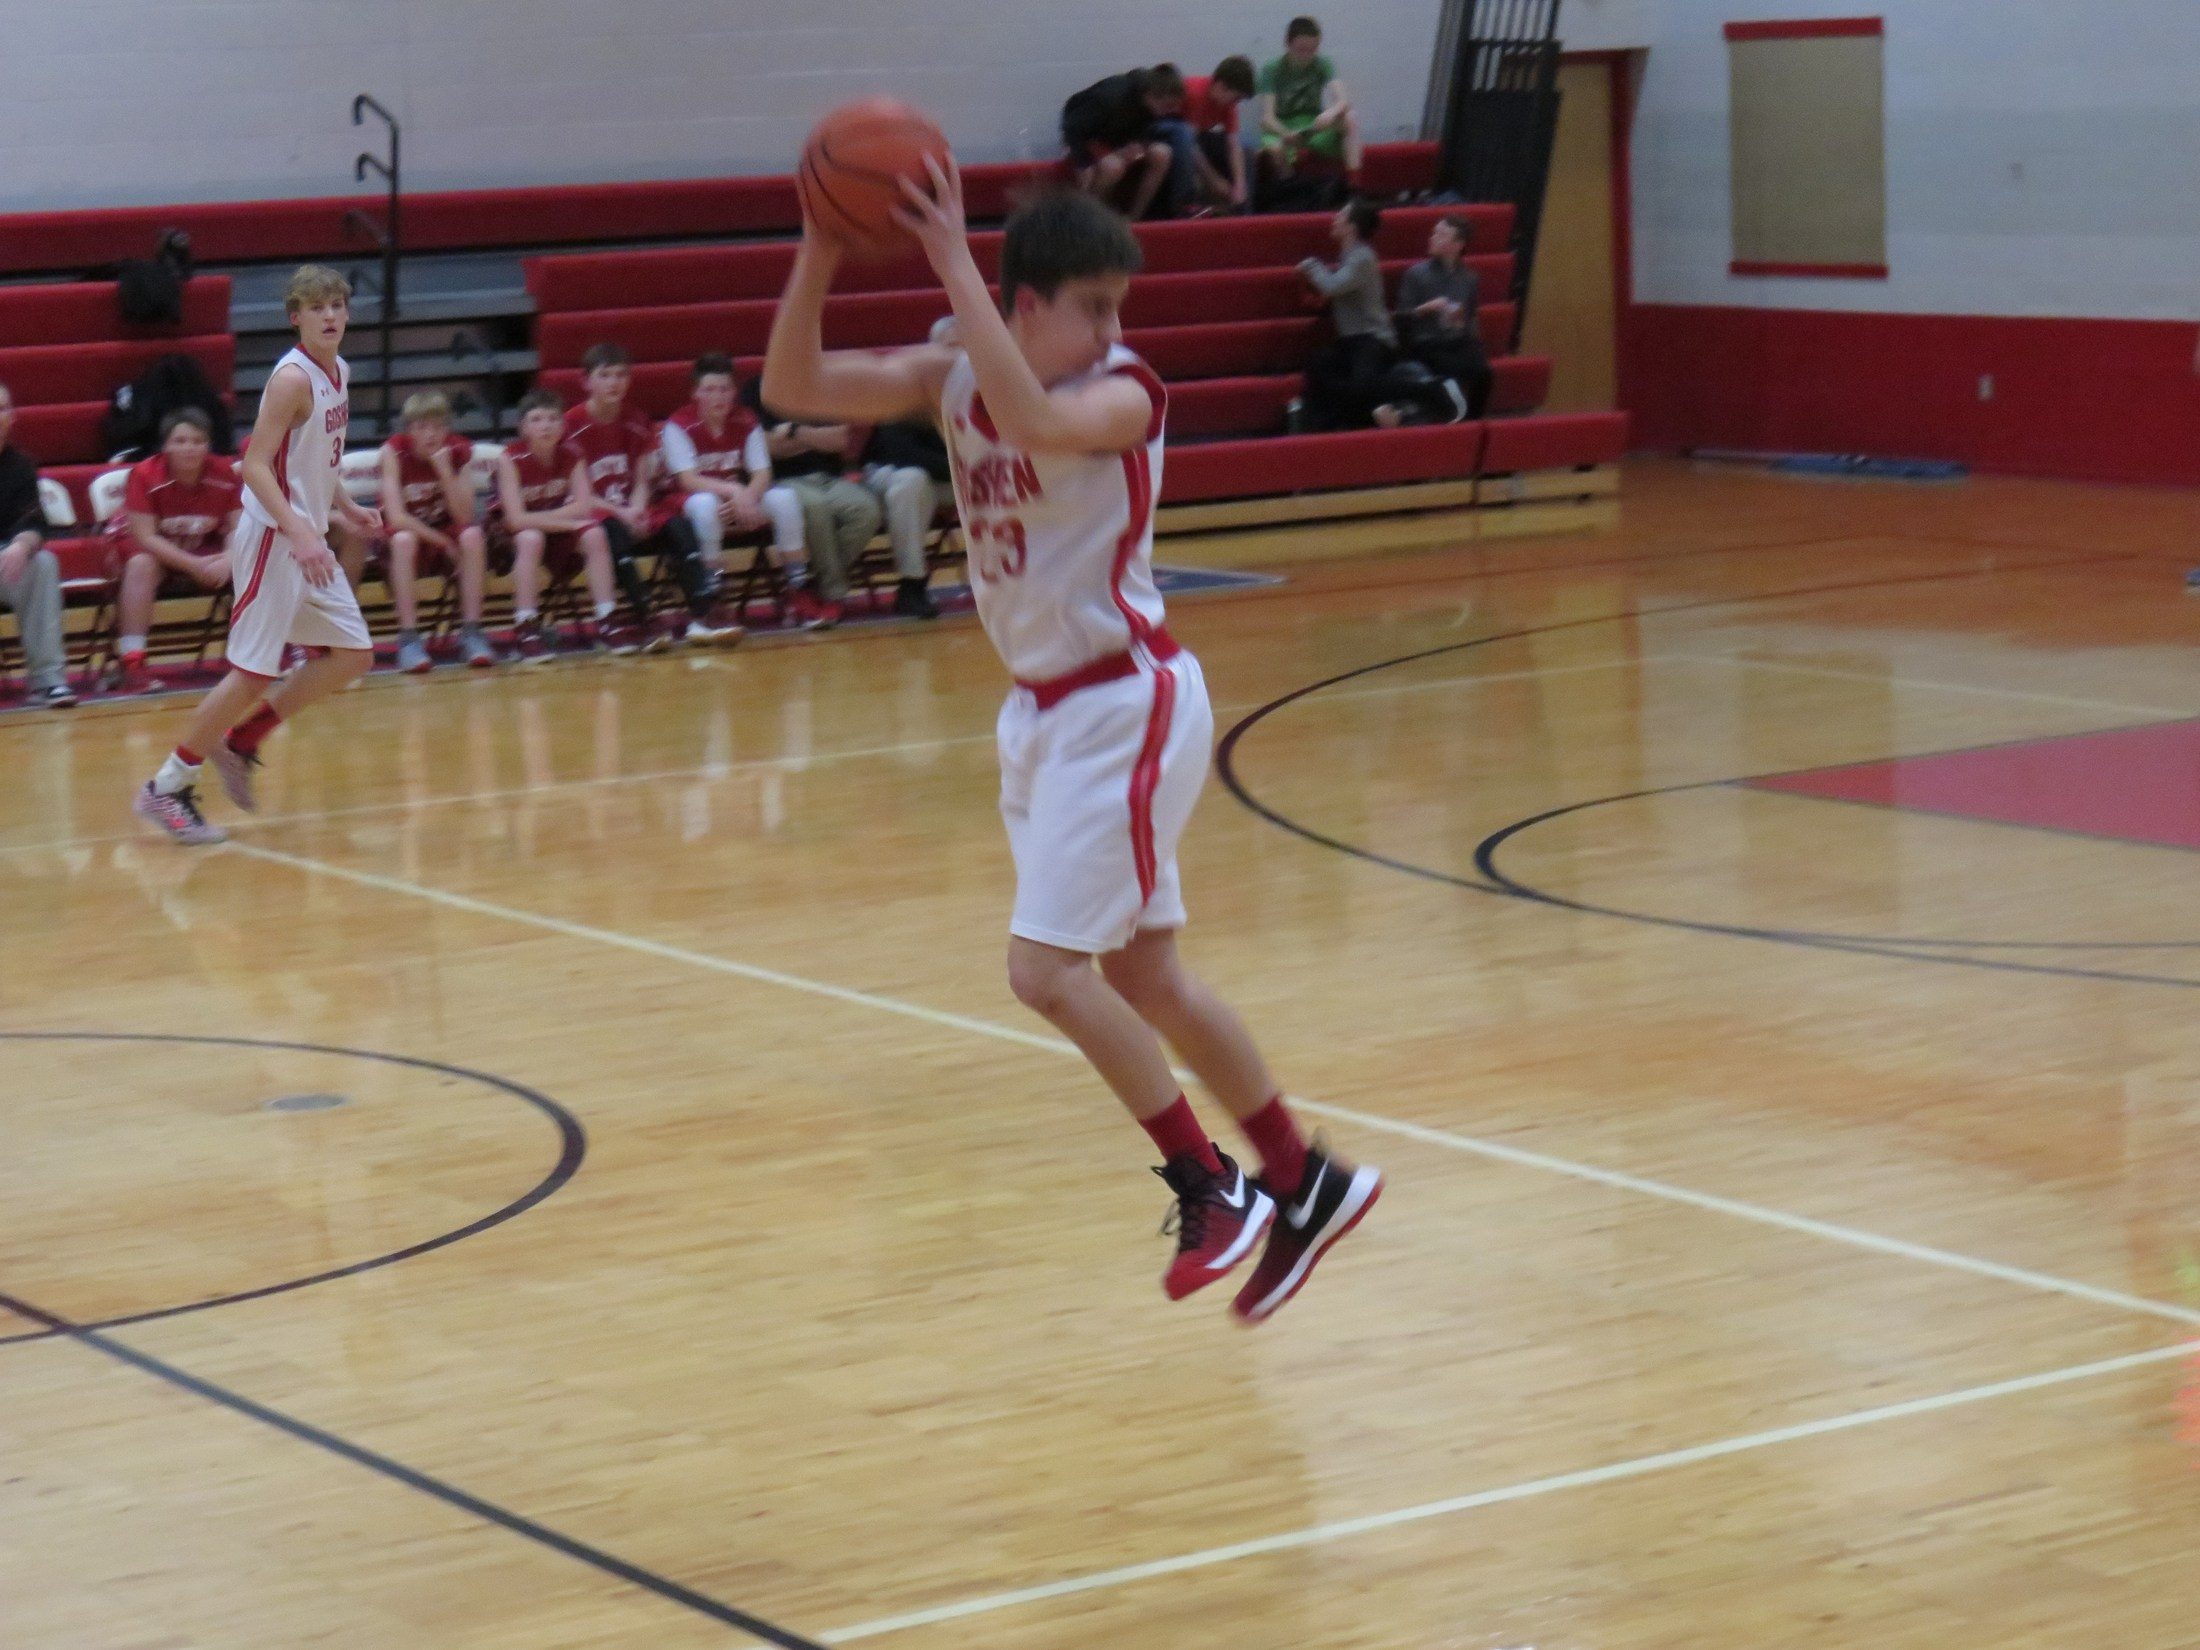 8th grade boys basketball player Jacob McDaniel